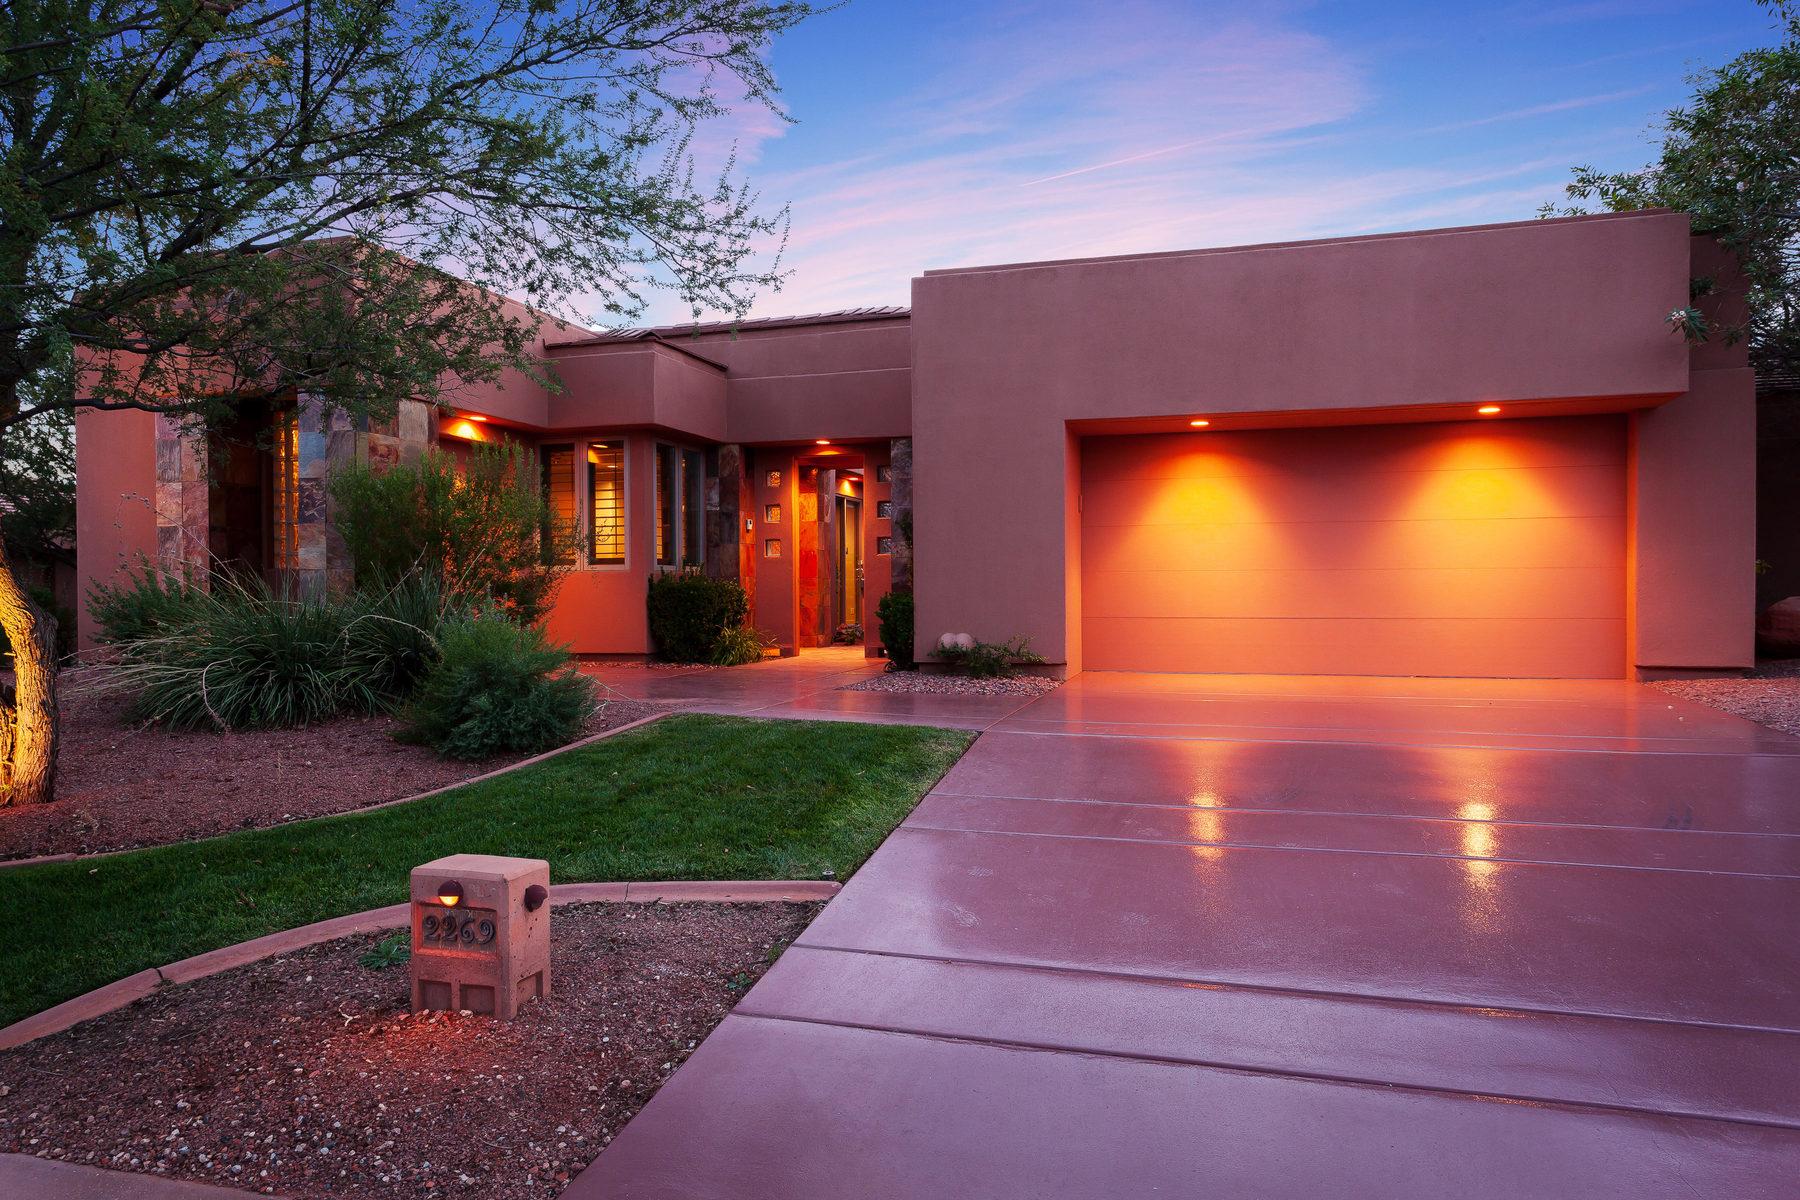 Villa per Vendita alle ore Golf Course Vistas 2269 N Cohonina Cir St. George, Utah, 84770 Stati Uniti